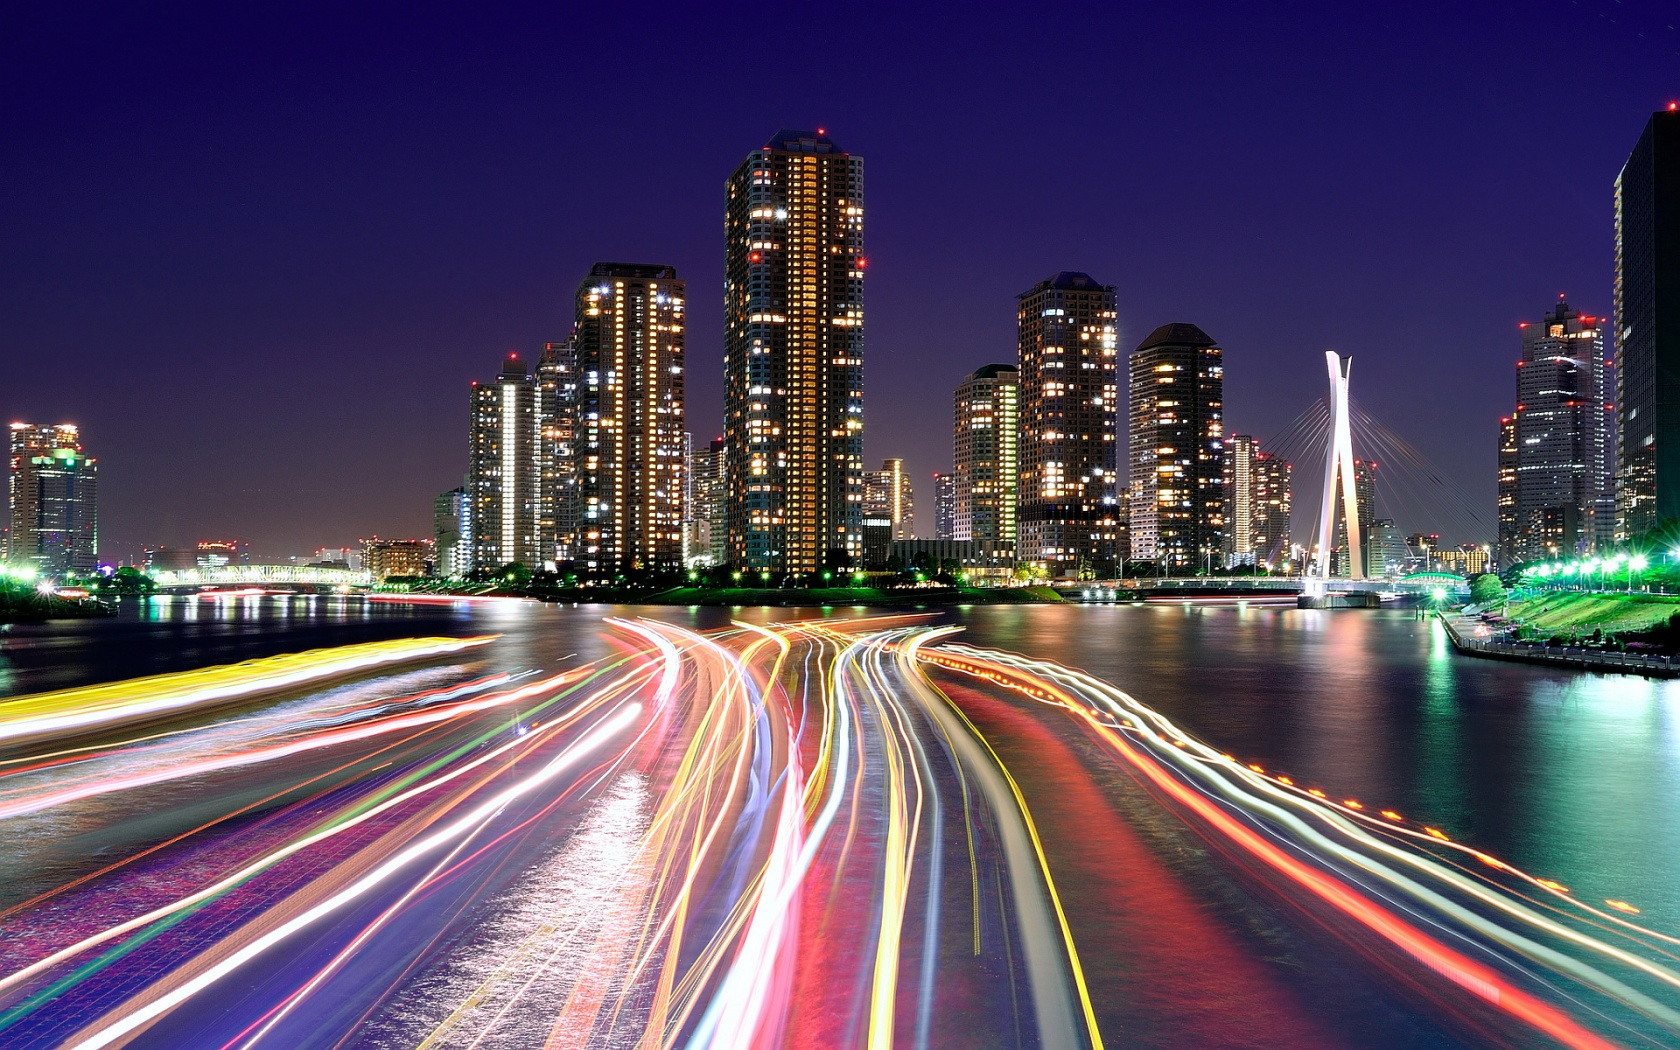 City Lights Wallpaper 24313